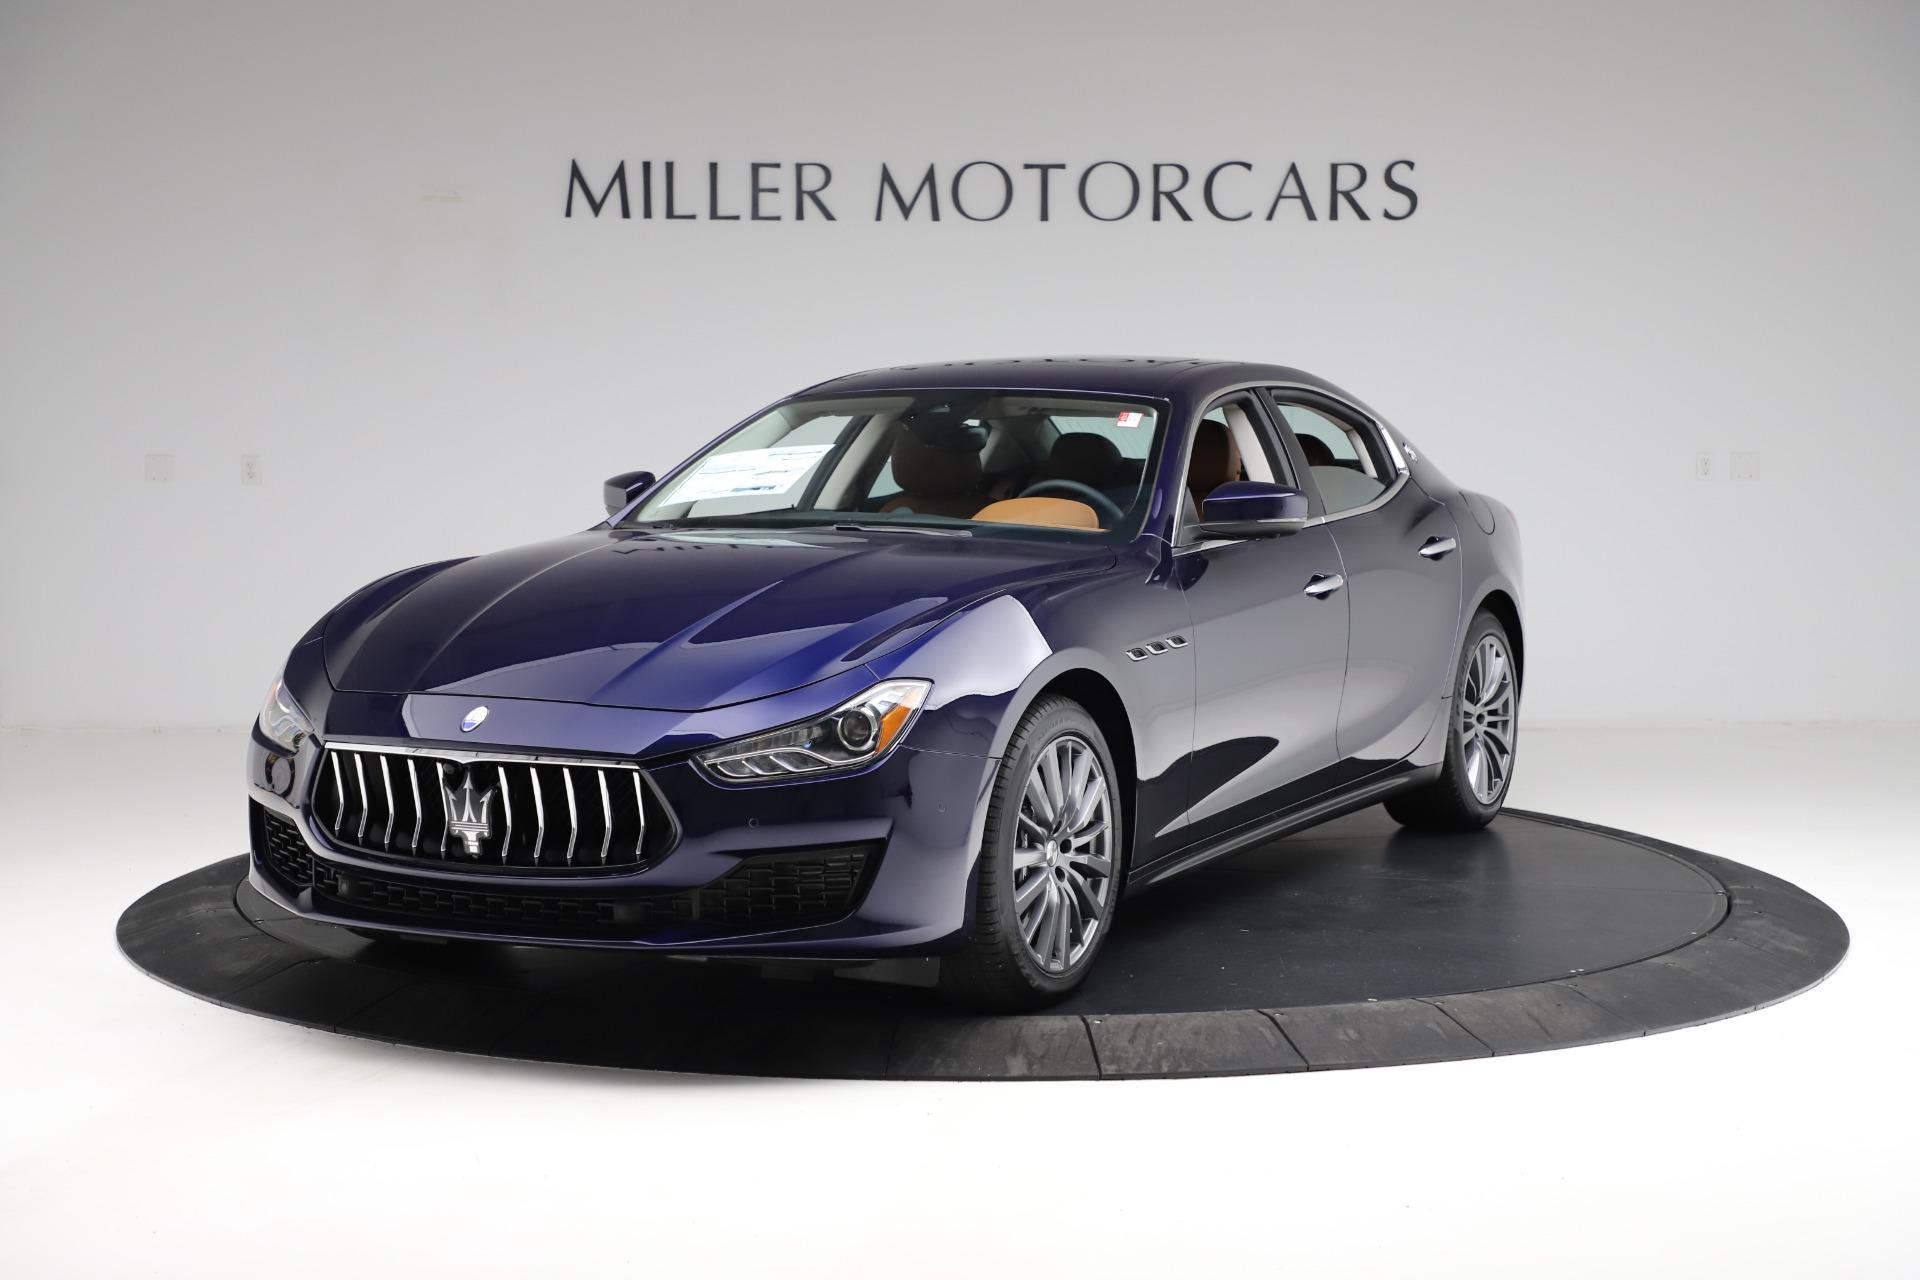 New 2021 Maserati Ghibli S Q4 for sale $86,954 at Maserati of Greenwich in Greenwich CT 06830 1